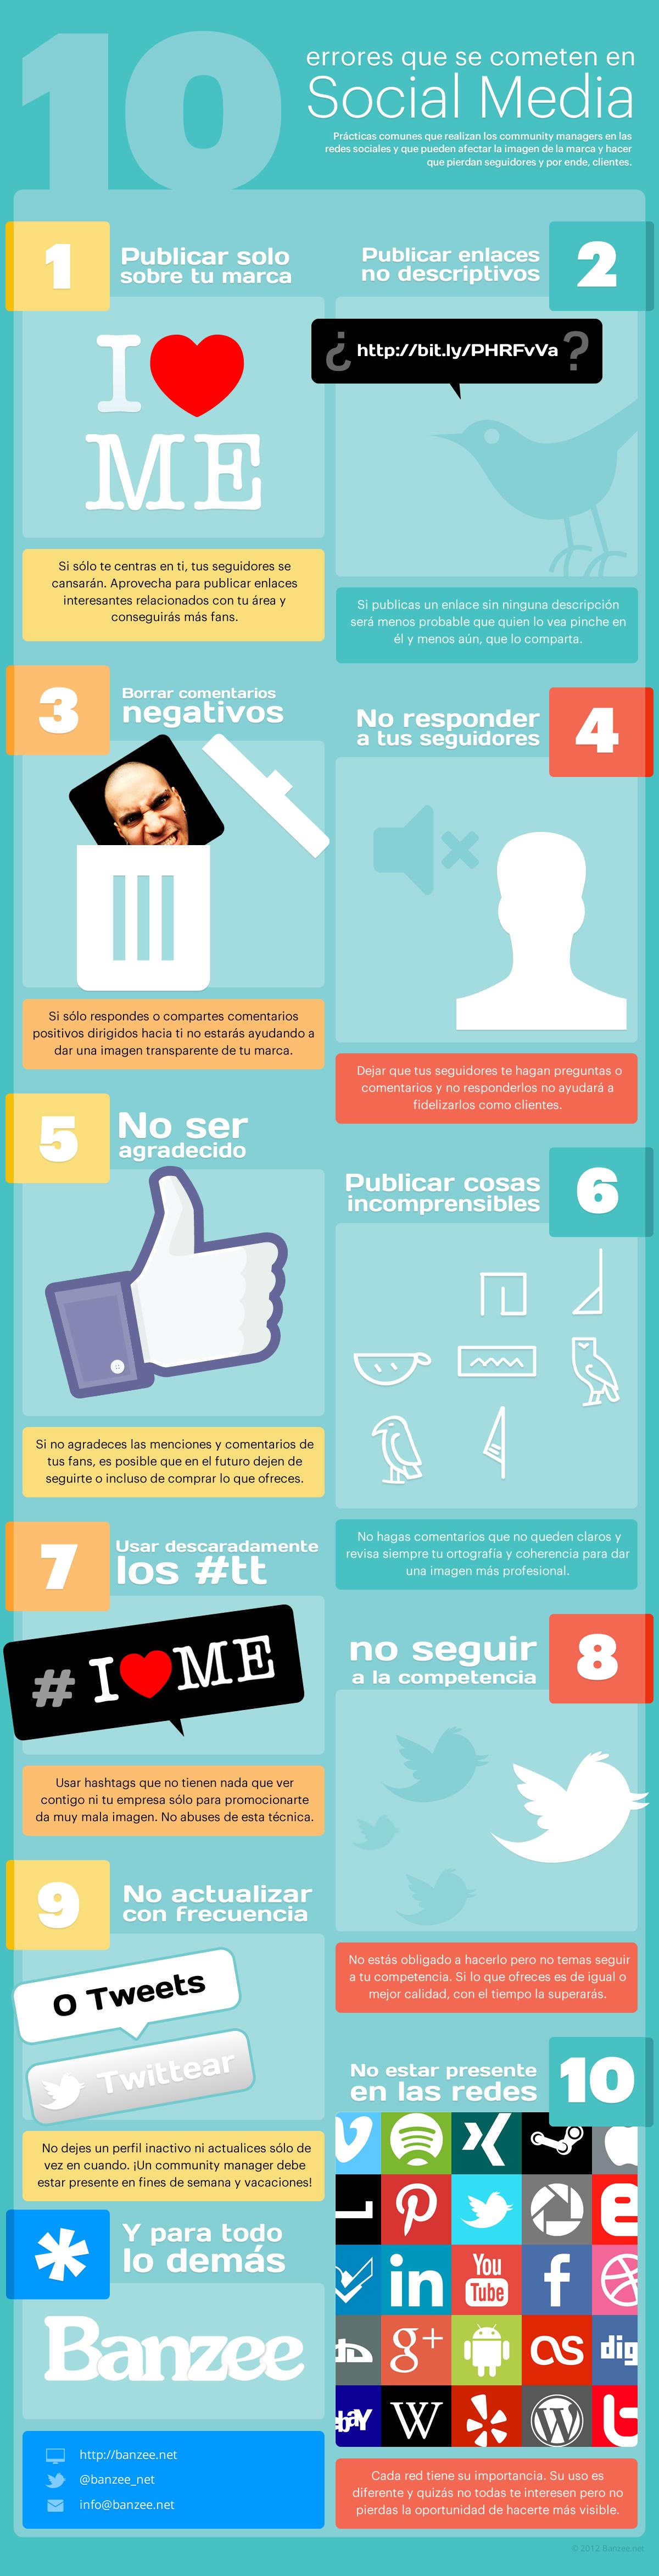 10 errores social media